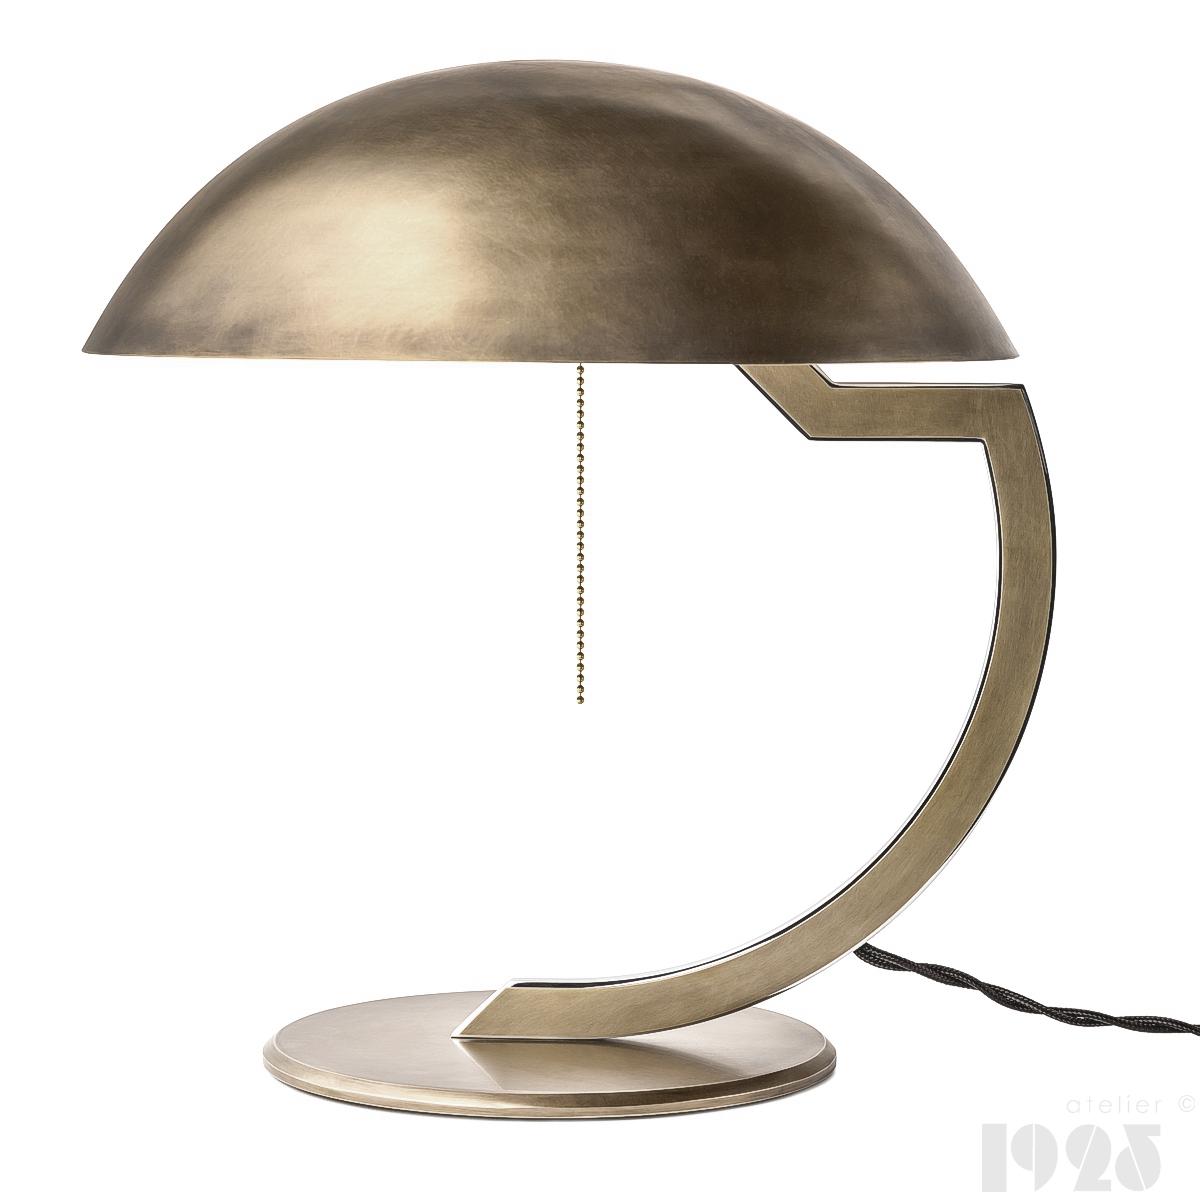 lampa-biurkowa-Art-Deco-_-lampa-stojąca-Art-Deco-_-LB-M-04-_-ATELIER-1925-_-1a